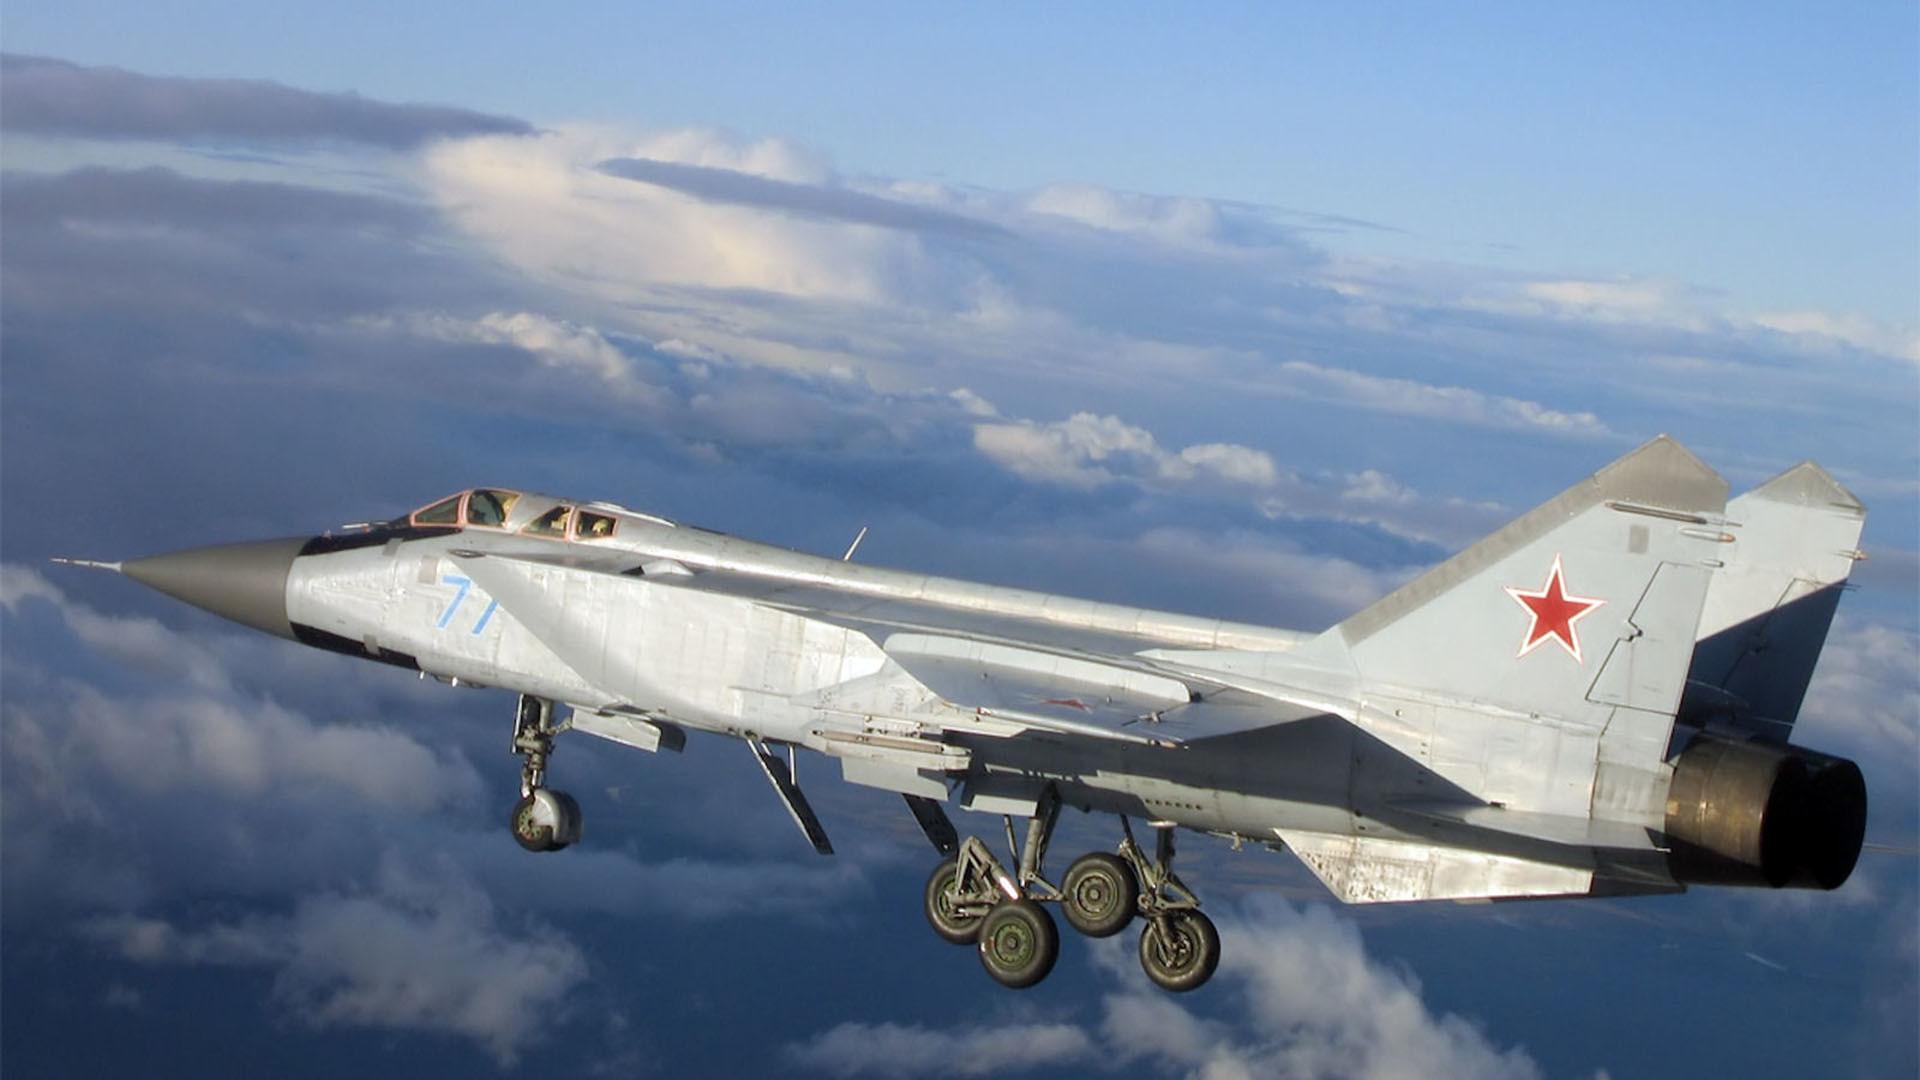 Mig-31 foxhound military jet wallpaper     220519   WallpaperUP